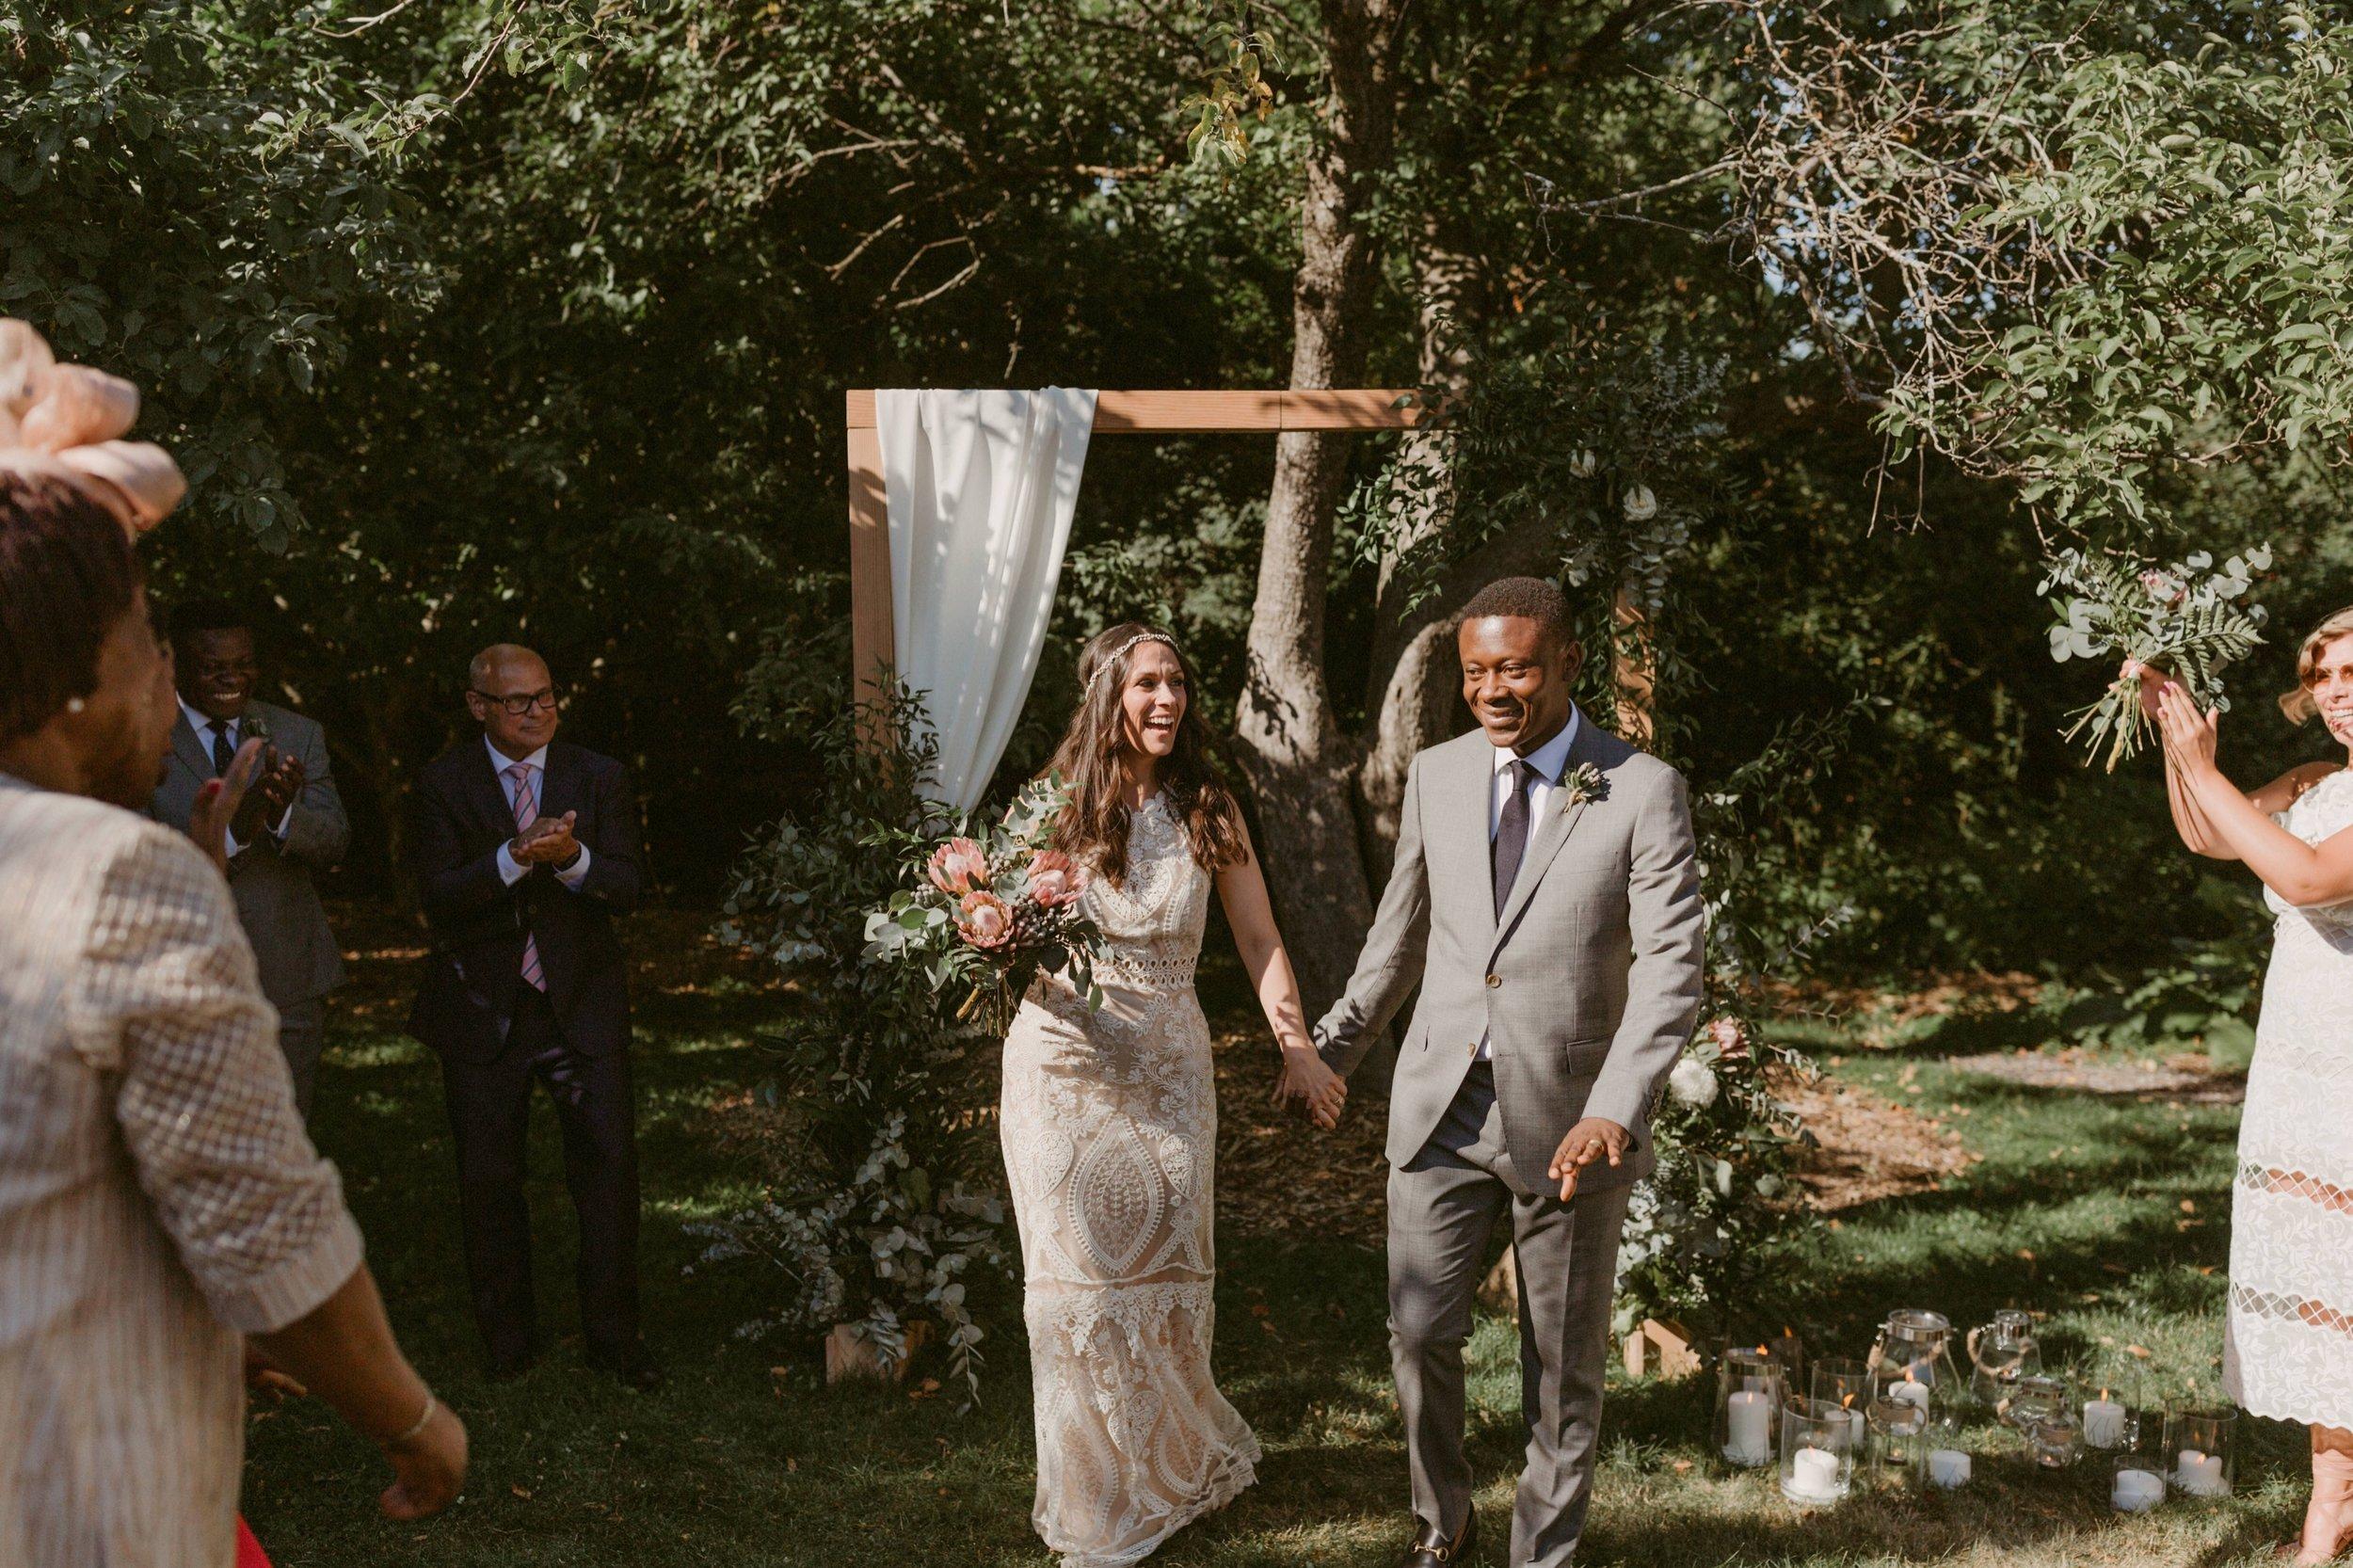 037_Spadina House Wedding (207 of 748)_House_Spadina_intimate_Toronto_Wedding.jpg